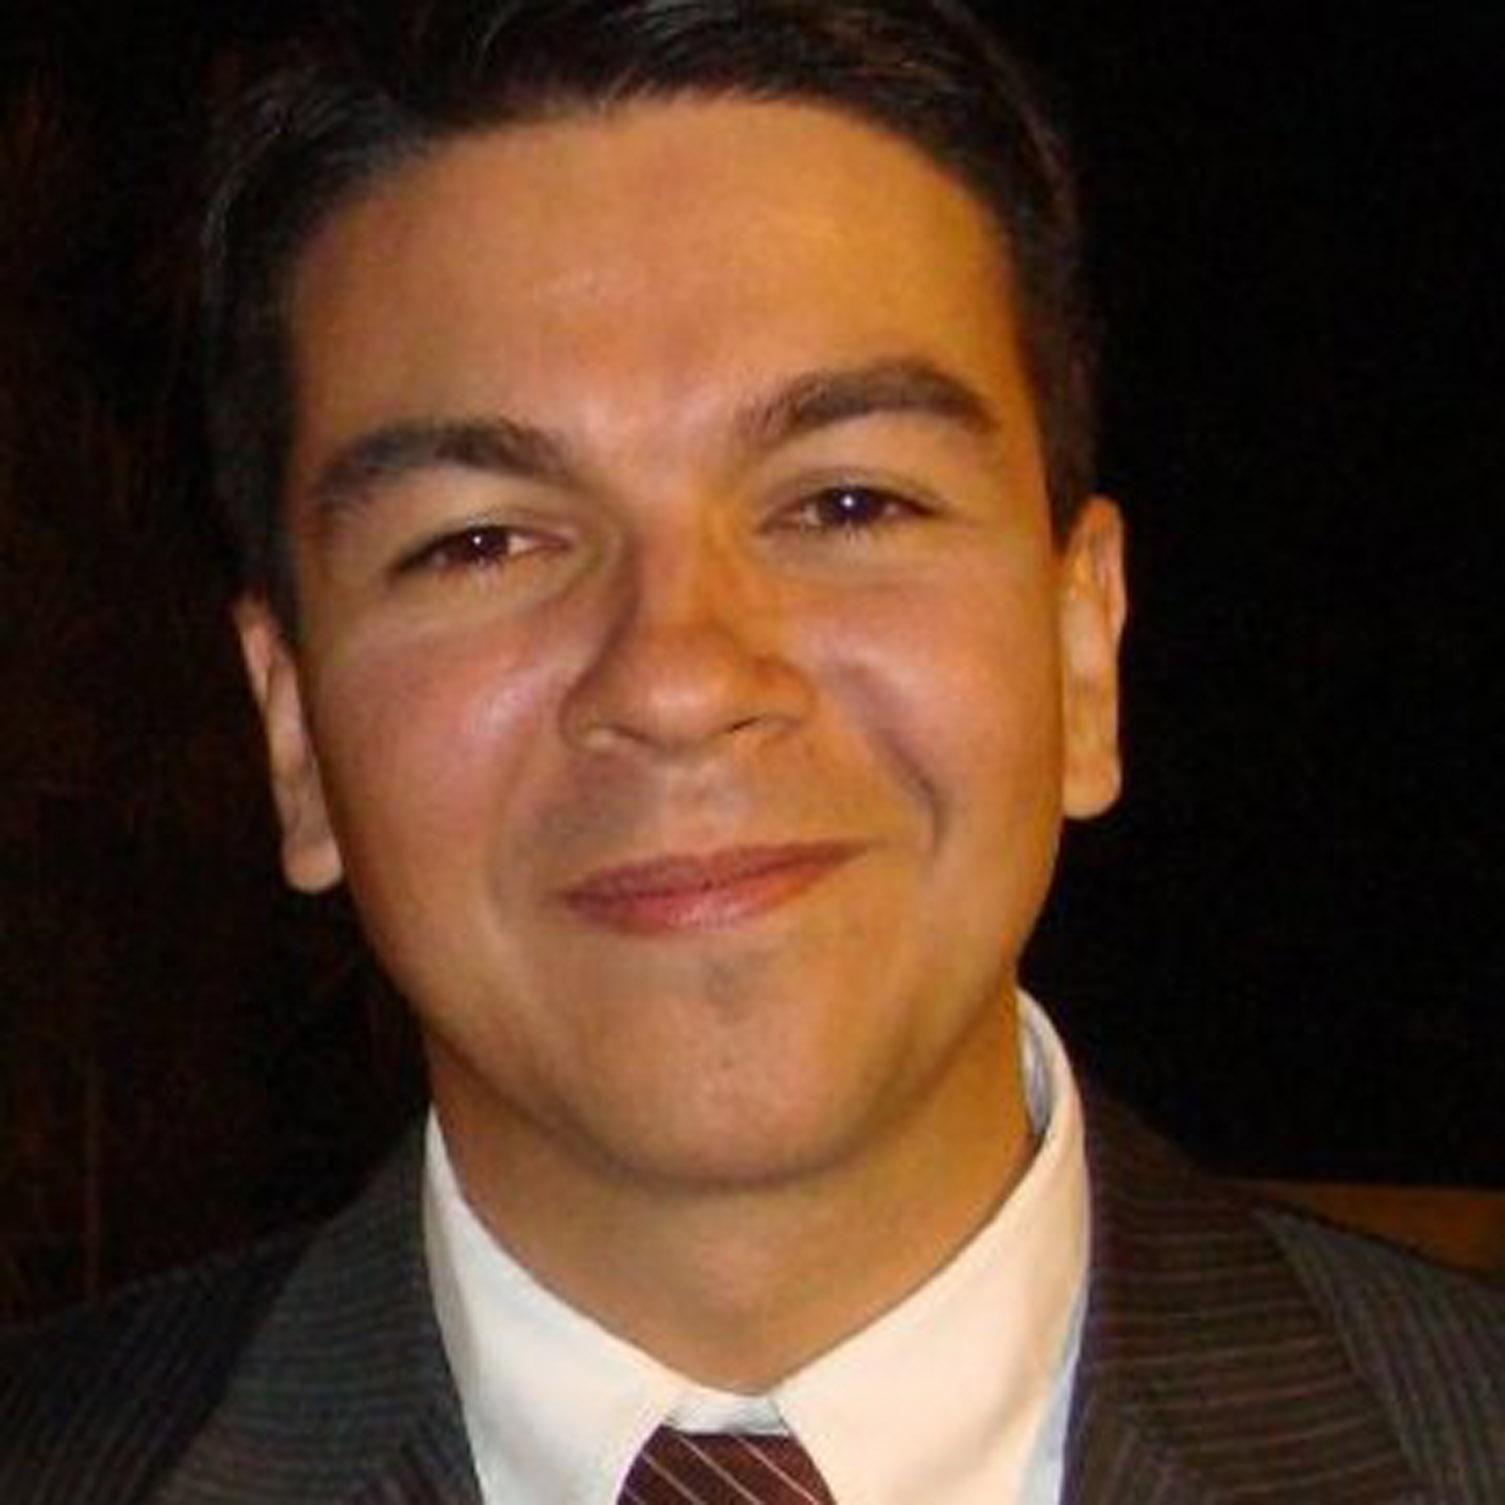 Luciano Sandoval